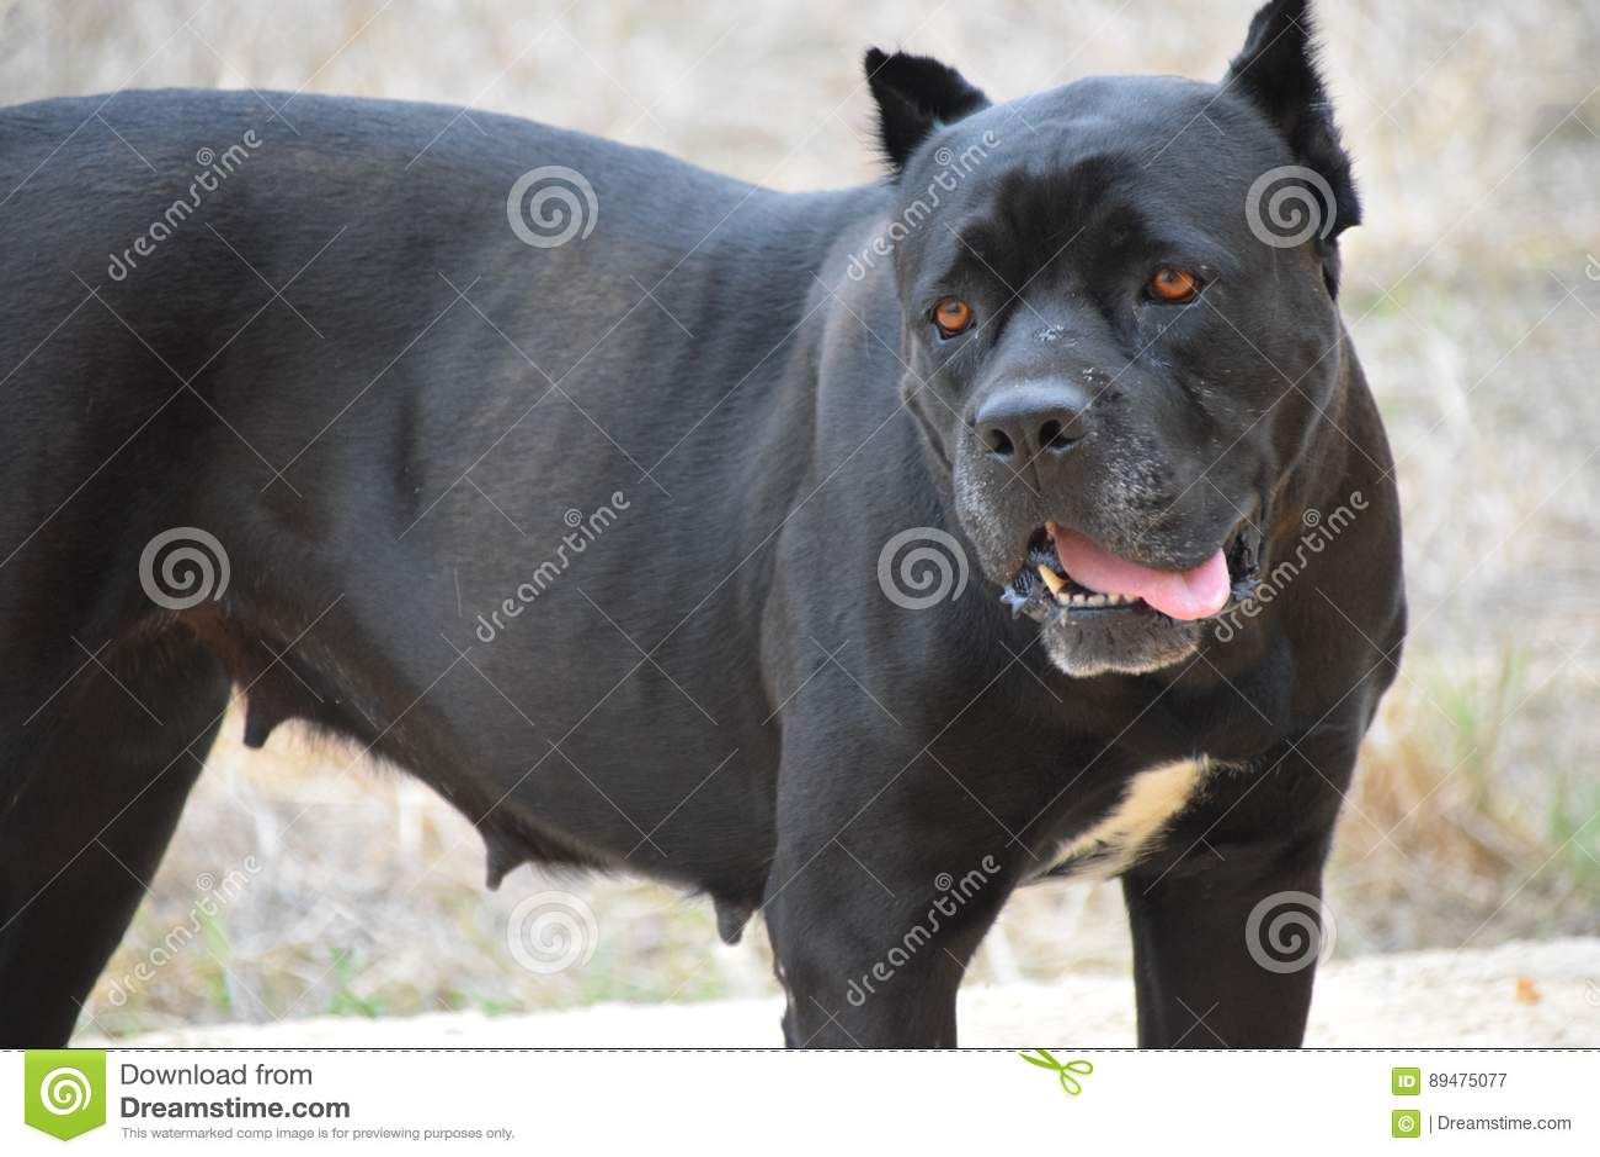 de zwarte hond wijfje kuilstier verdediger vriend metgezel intelligente ogen gele ogen. Black Bedroom Furniture Sets. Home Design Ideas